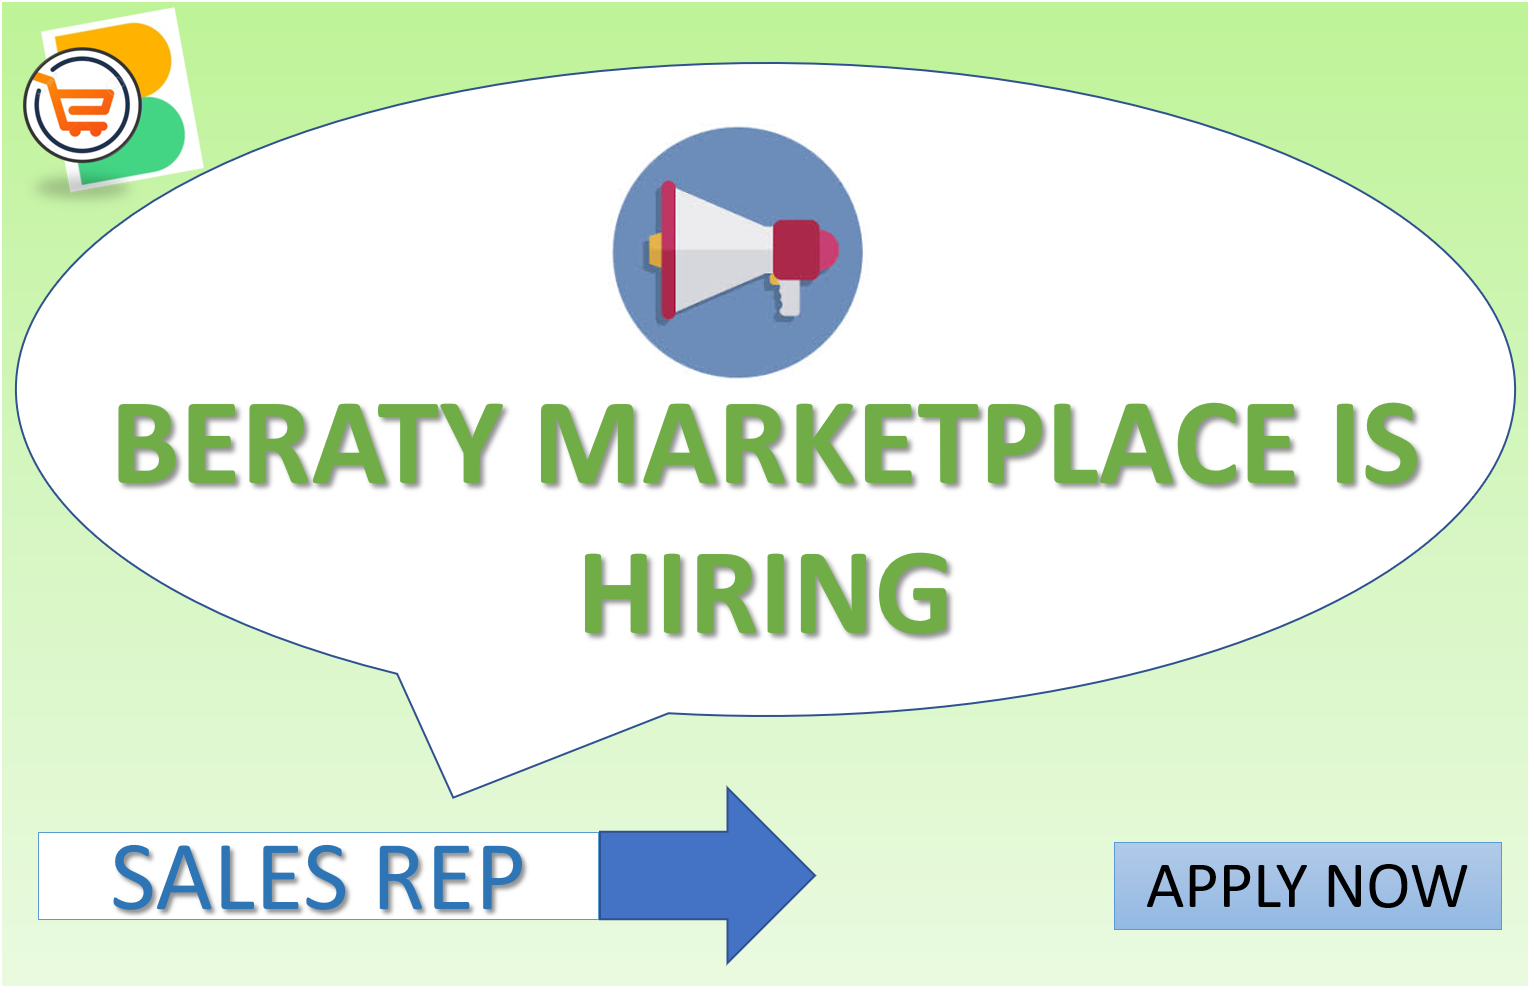 Beraty is hiring